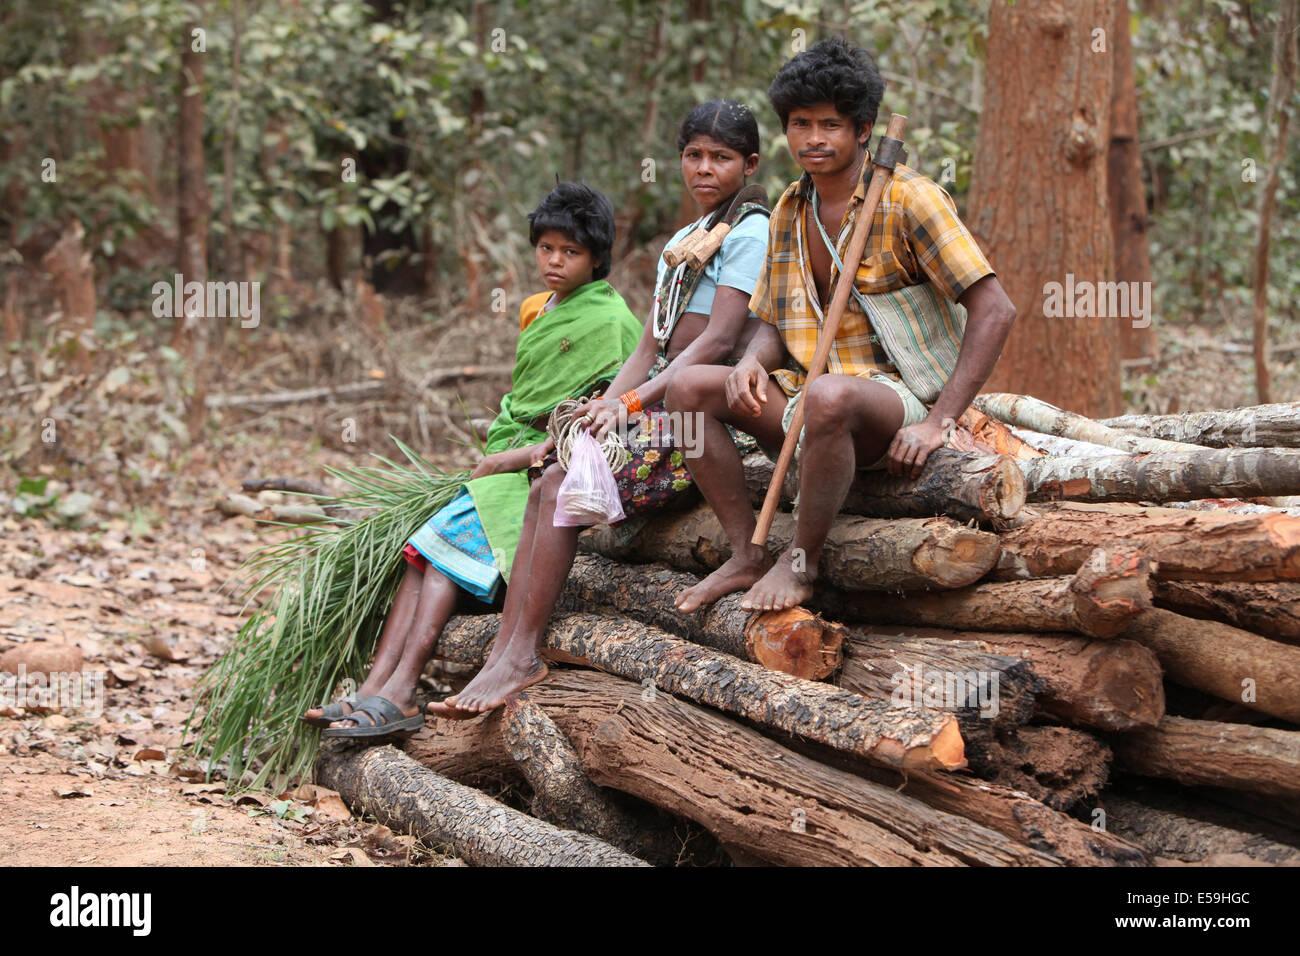 Abhuj Maria Tribal Familie sitzt auf Holz protokolliert im Rainpul Wald, Orrcha, Chattisgadh, Indien Stockbild